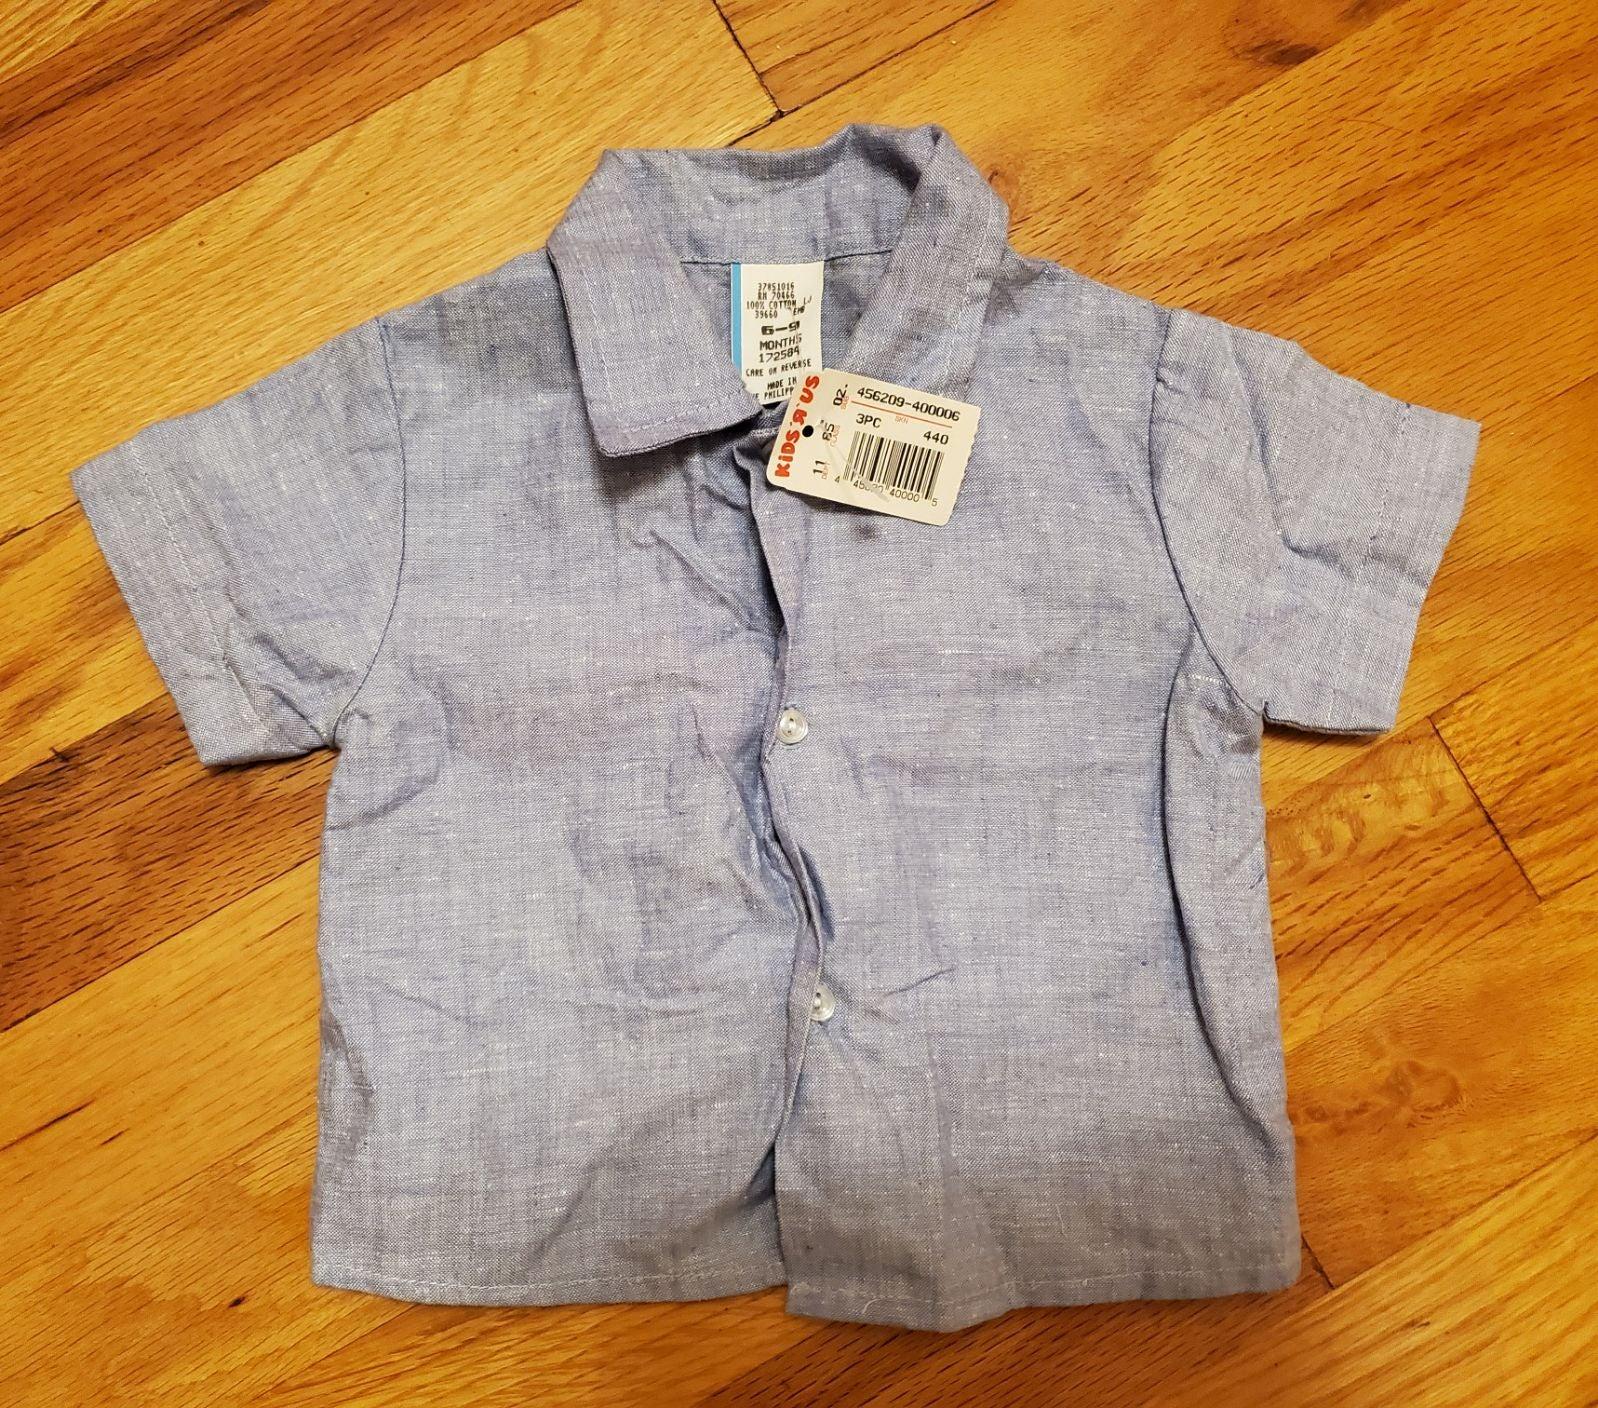 Vintage boys blue button up shirt 6-9 mo